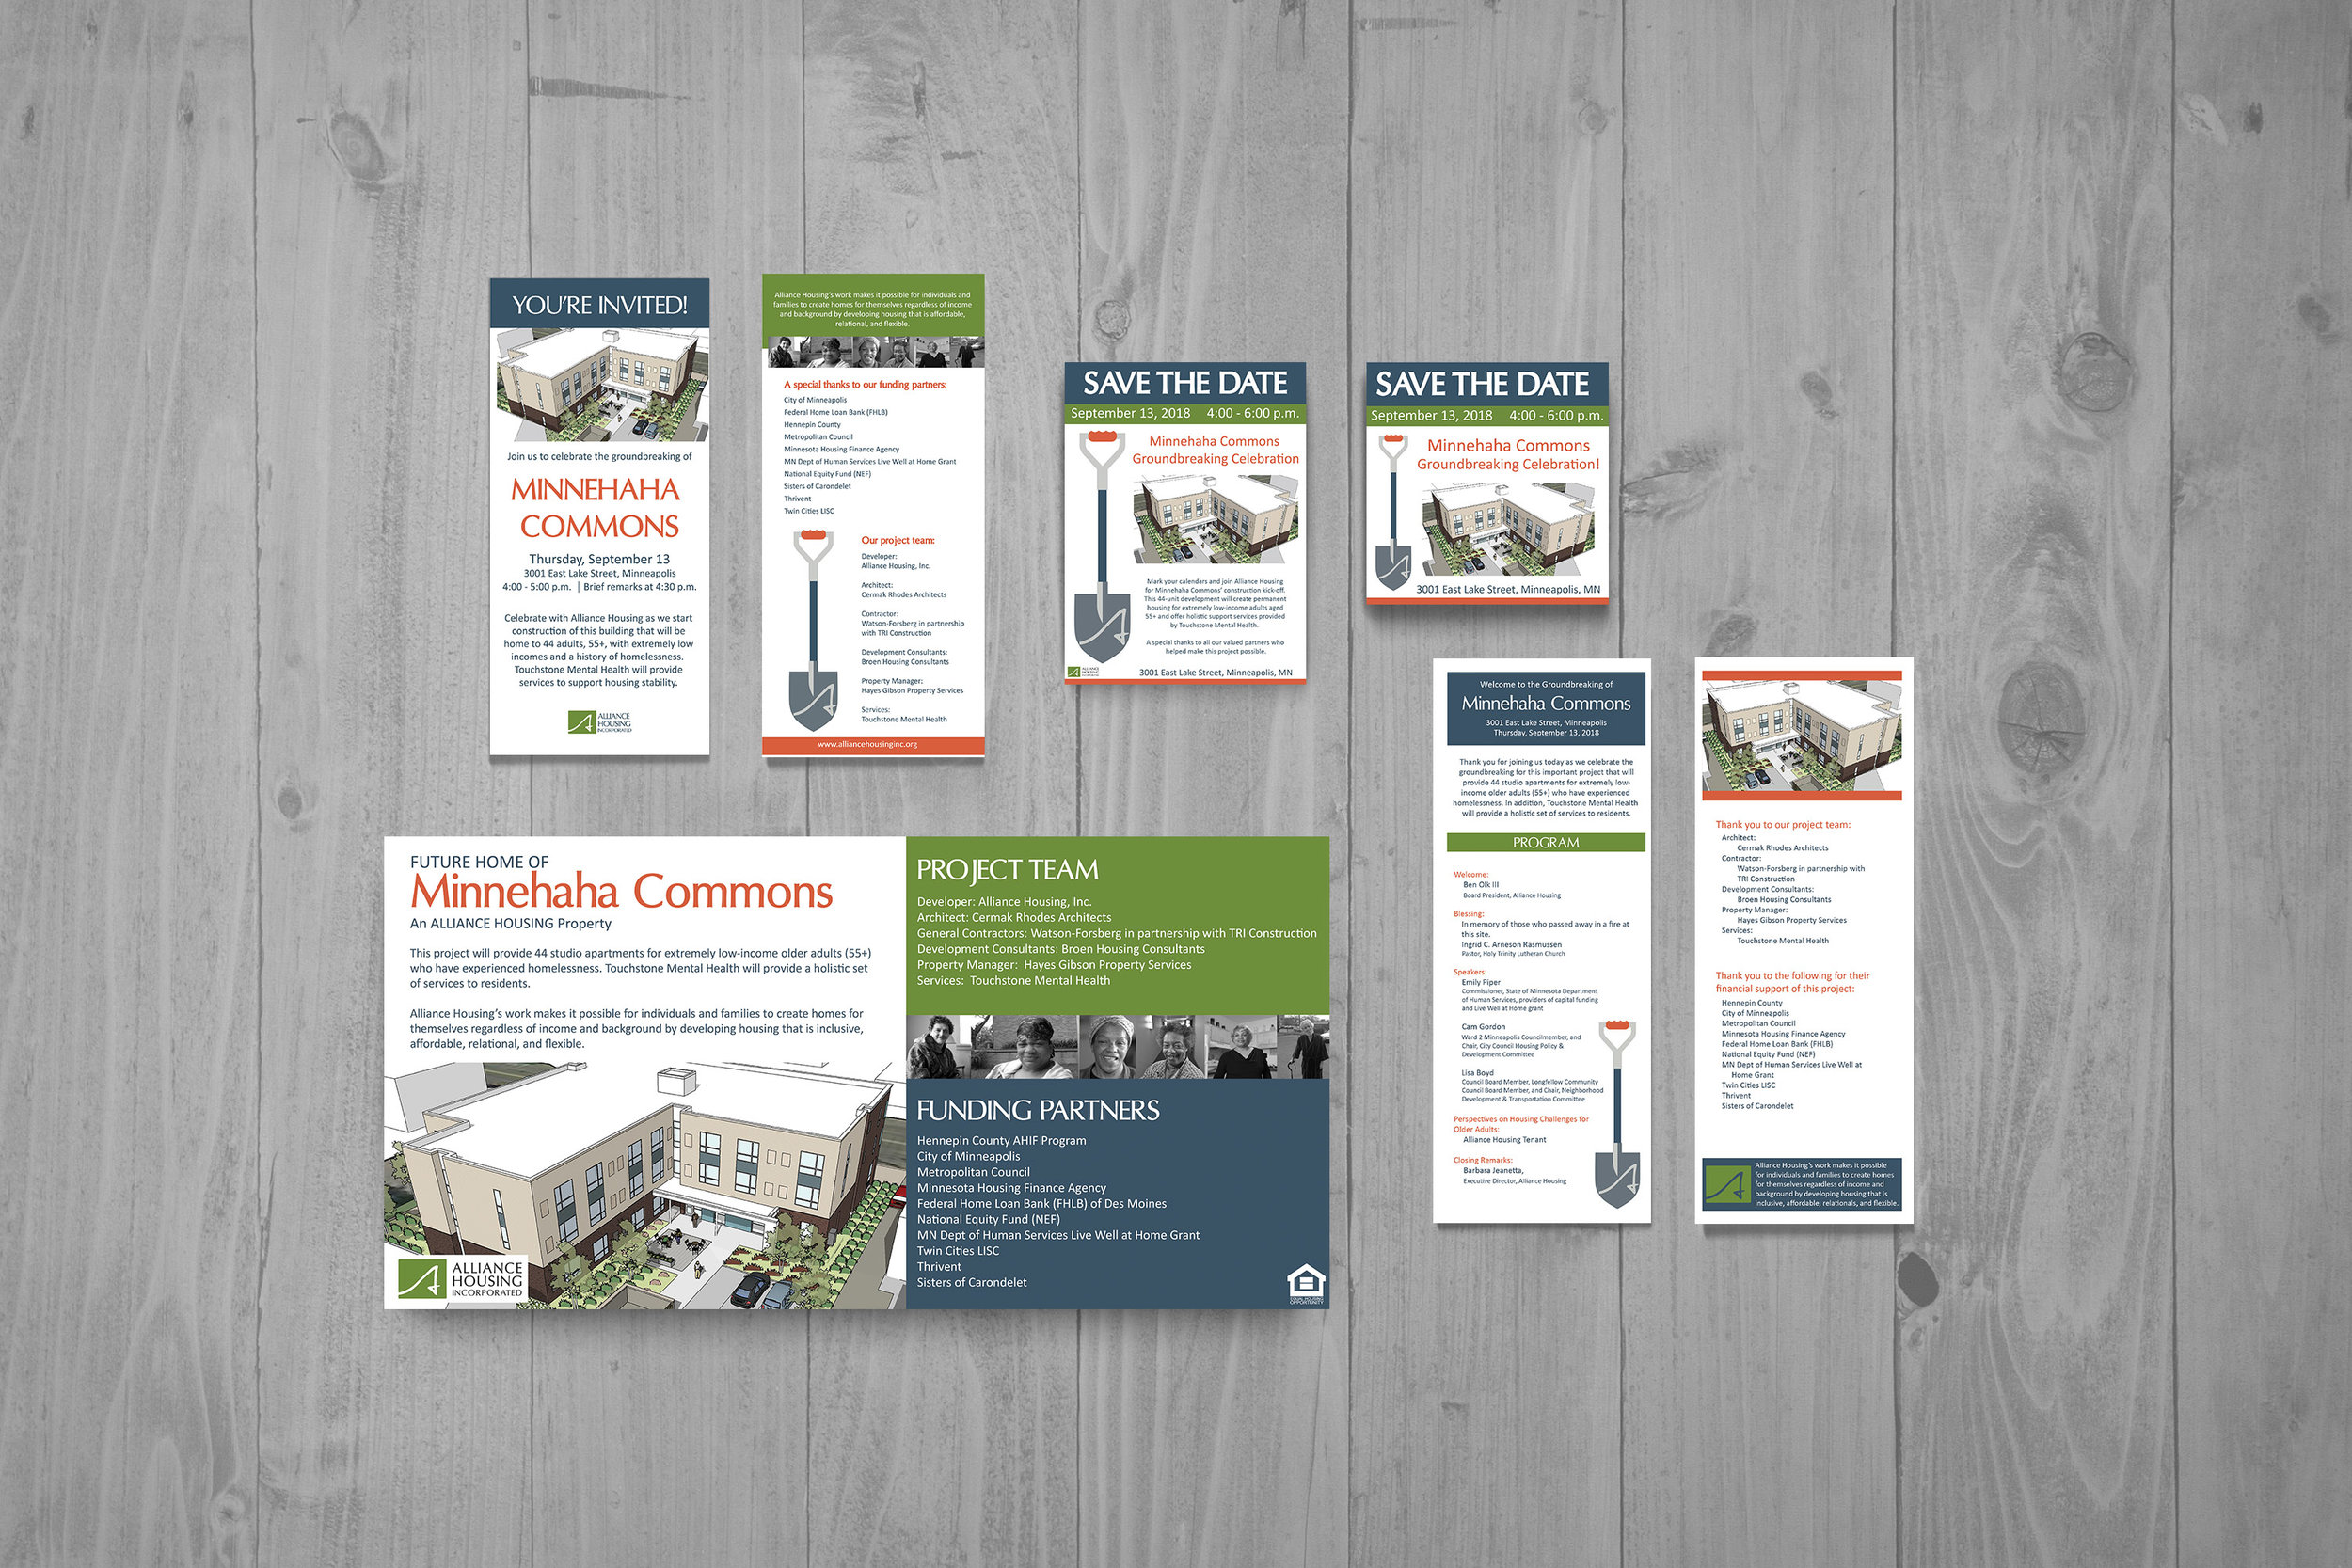 Invitation Suite Design - Save the Date, Invitation, Program, Construction Site Sign